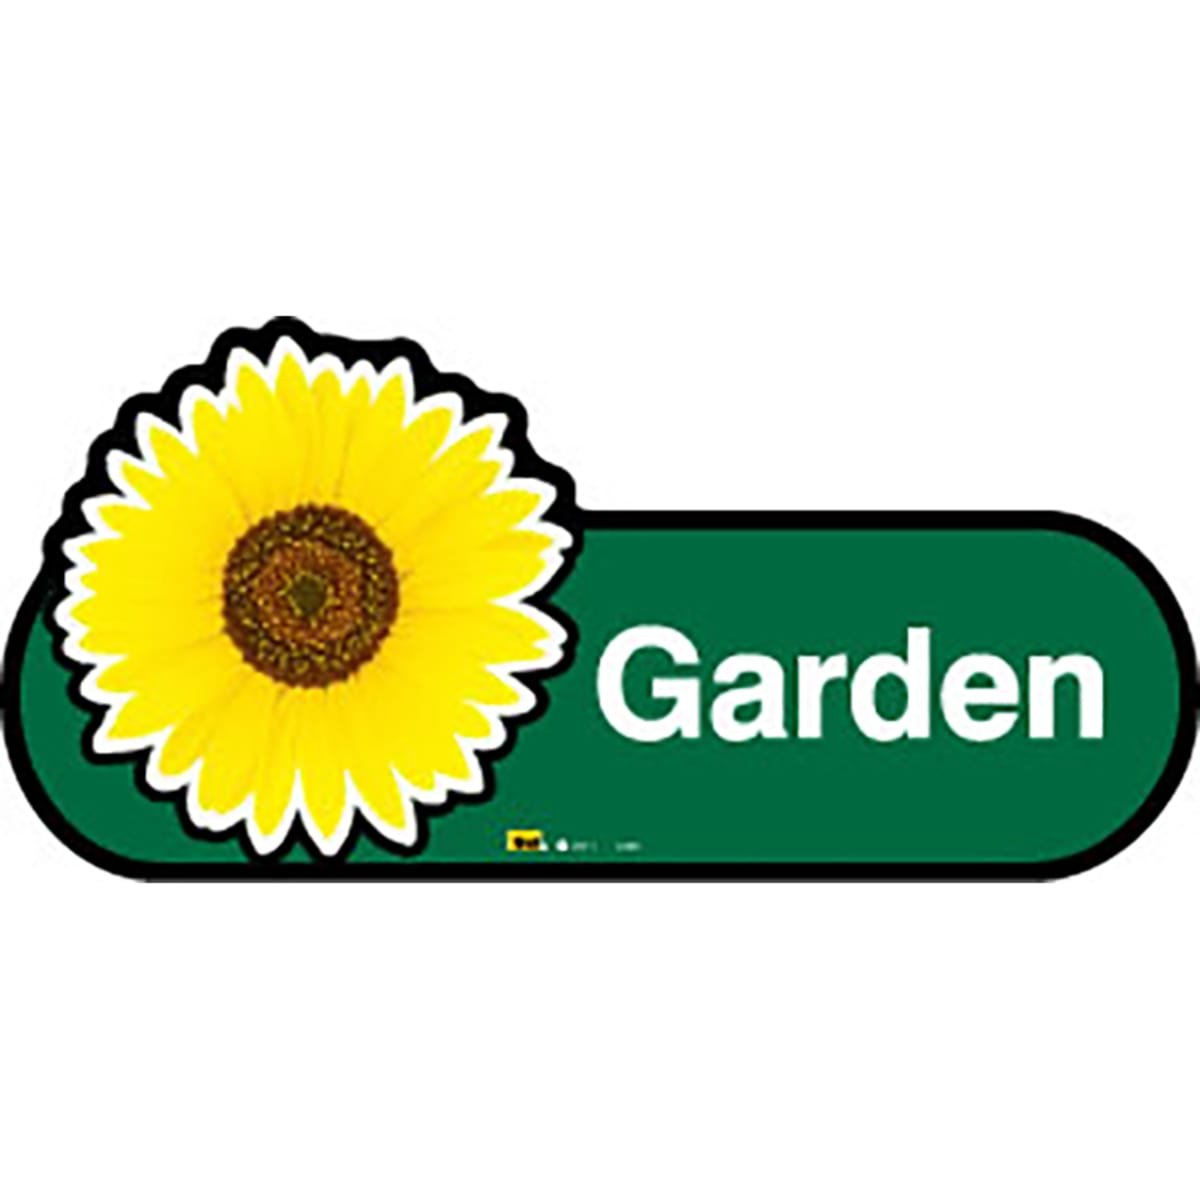 Dementia Friendly Garden Room - Green Sign -400mm Wide with Screw Fix by Dementia Friendly